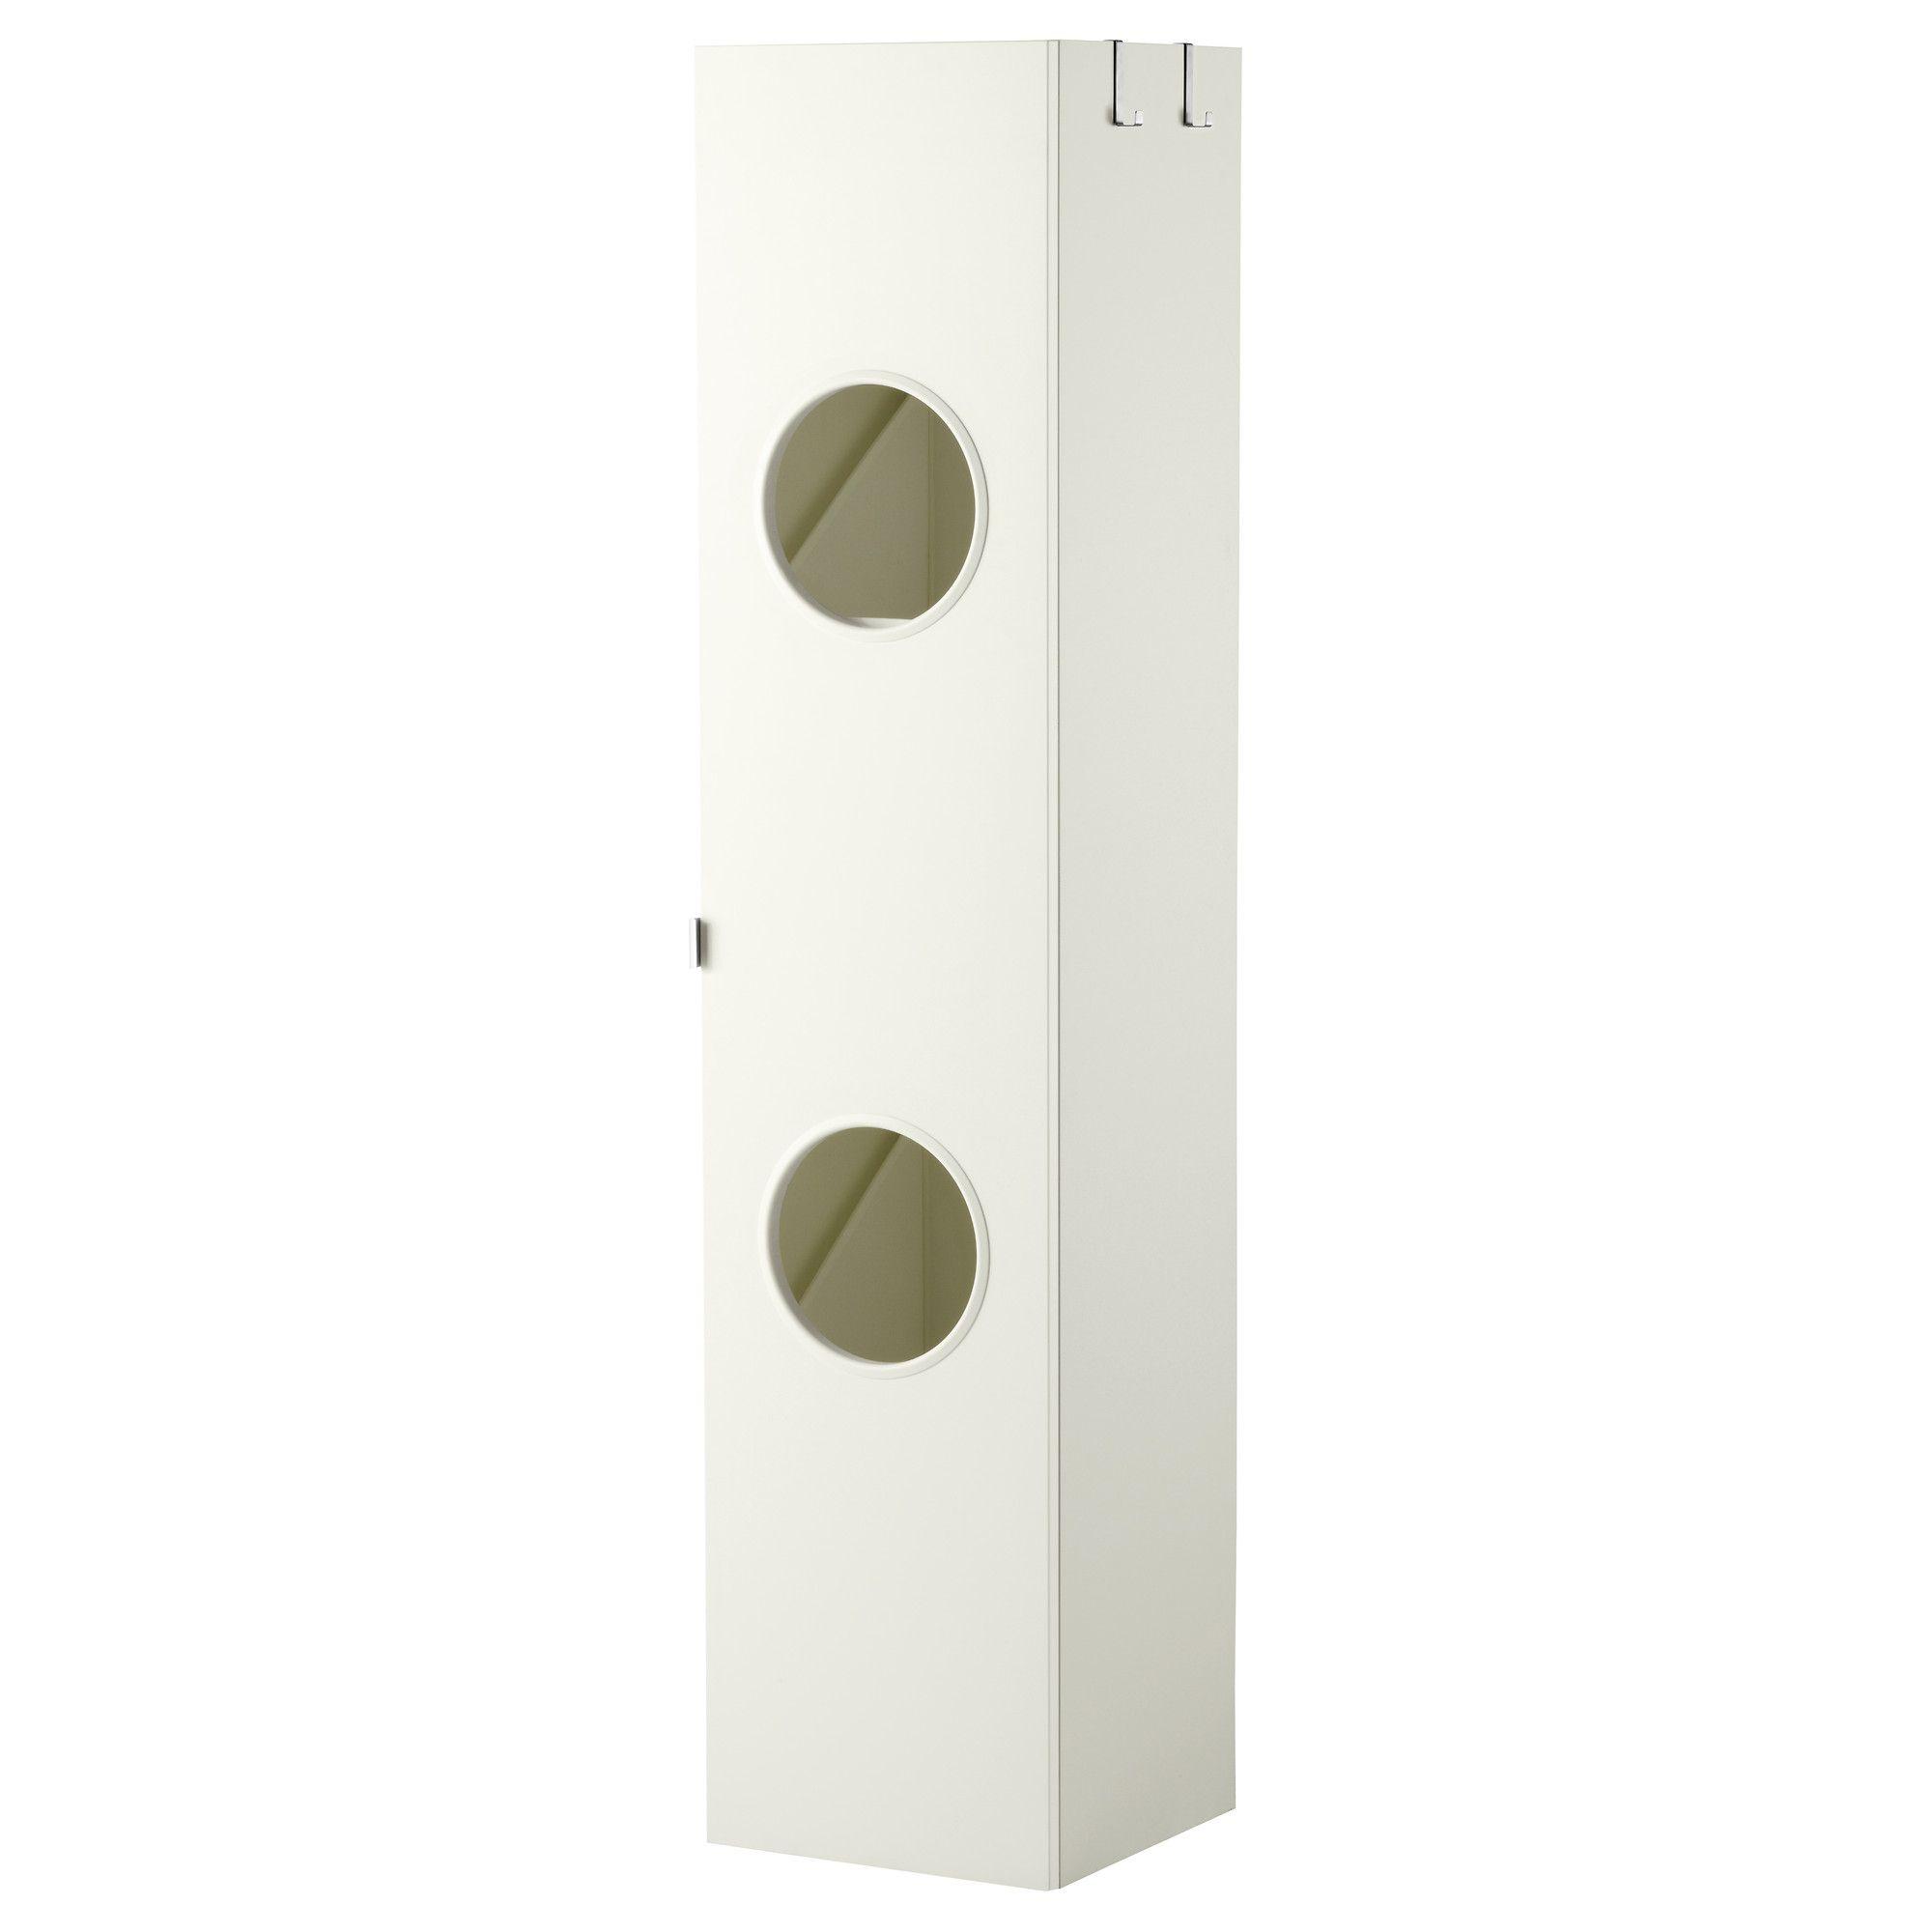 LILLNGEN Armario para colada Blanco 40 x 38 x 179 cm